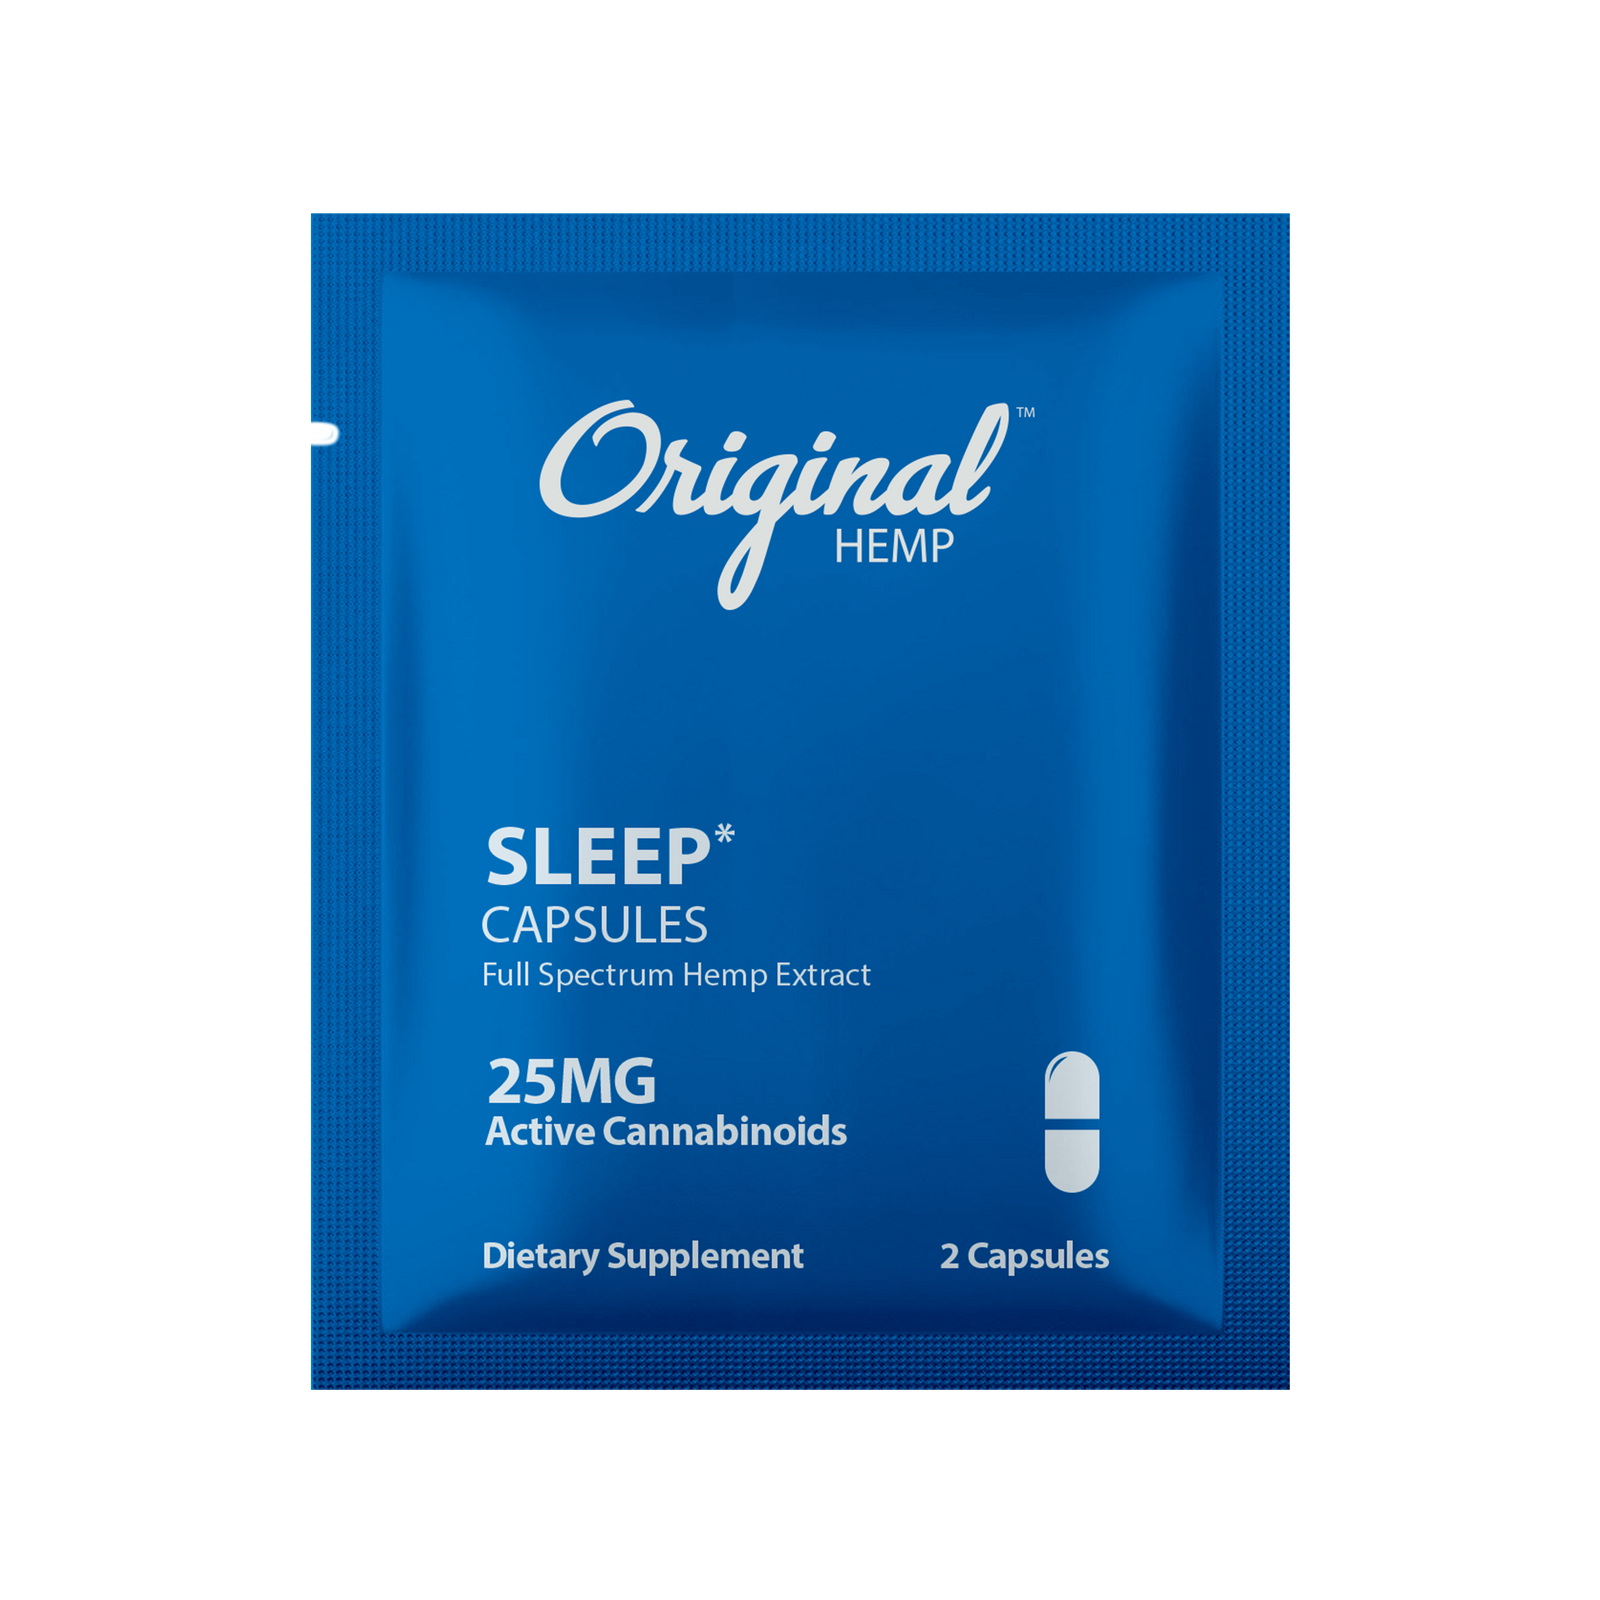 Original Hemp Sleep Daily Dose Capsules - 25 mg